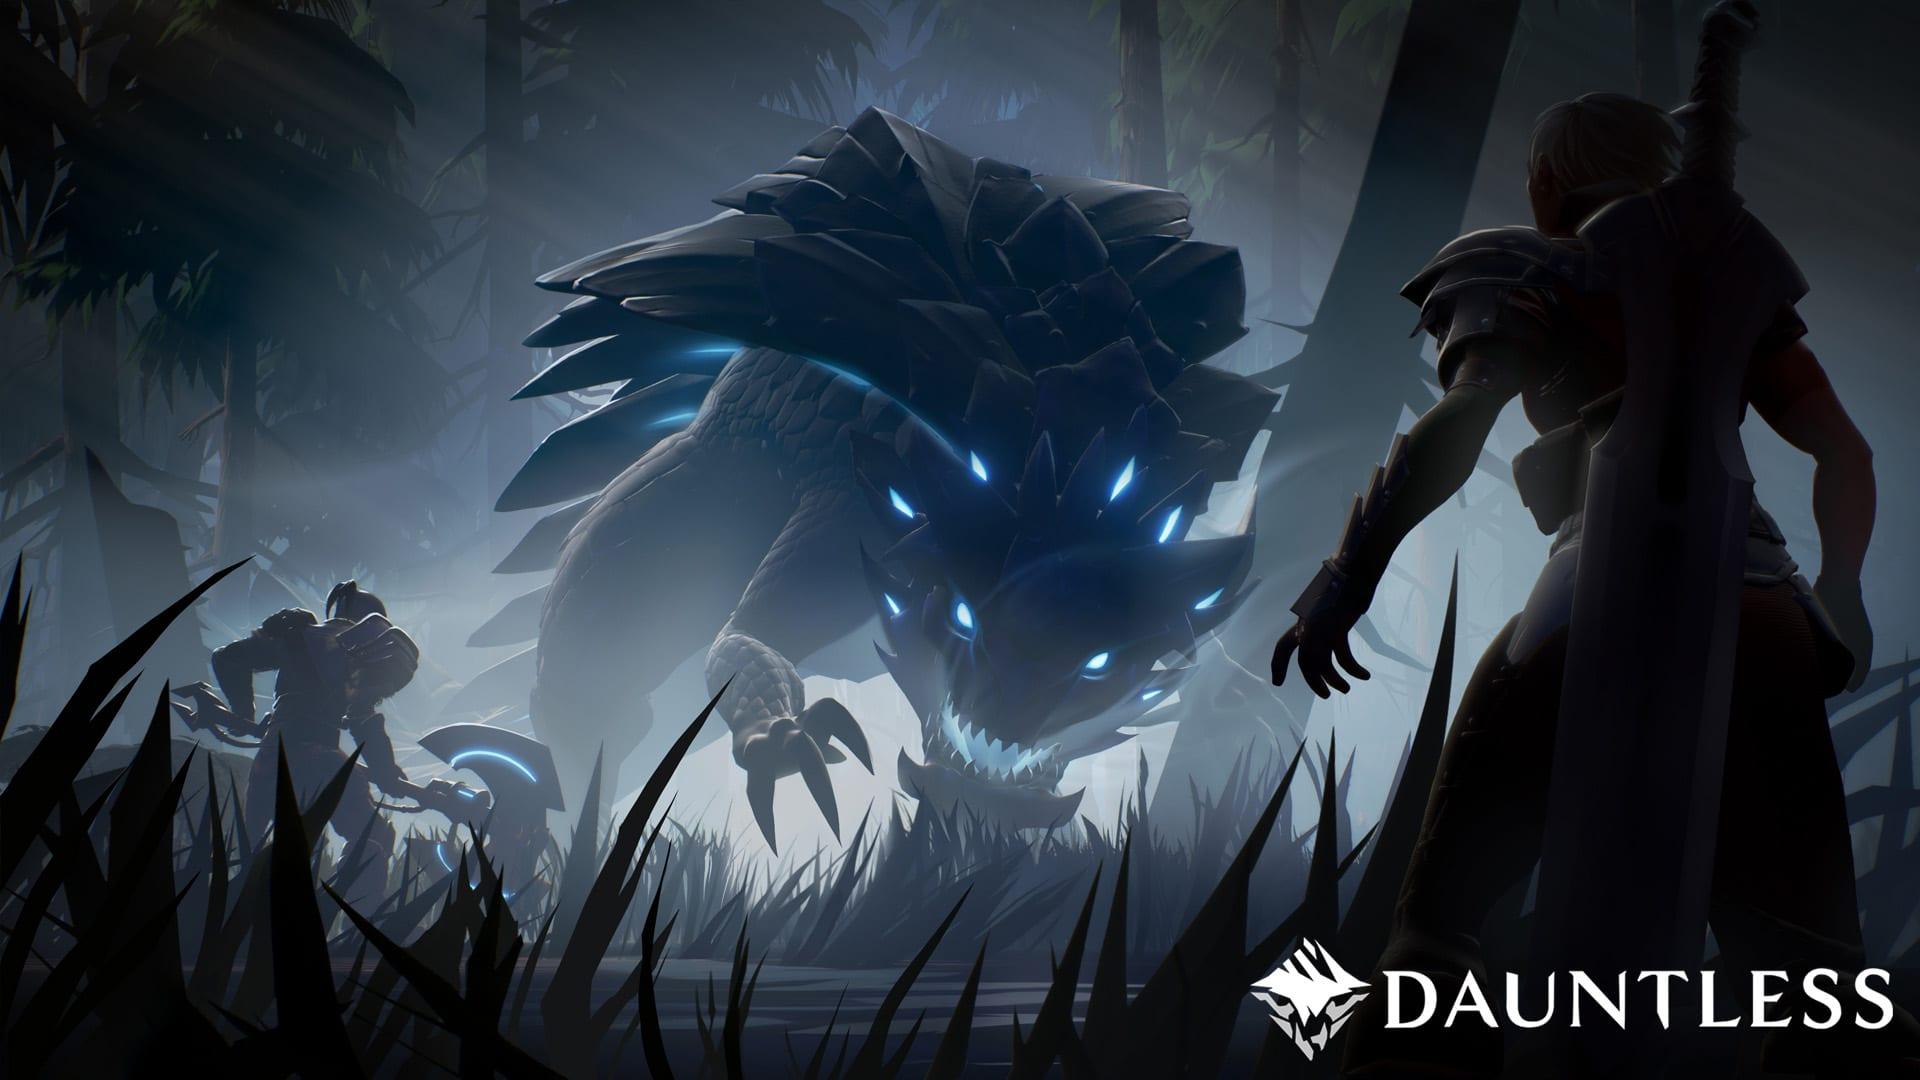 Dauntless Closed Beta Impressions